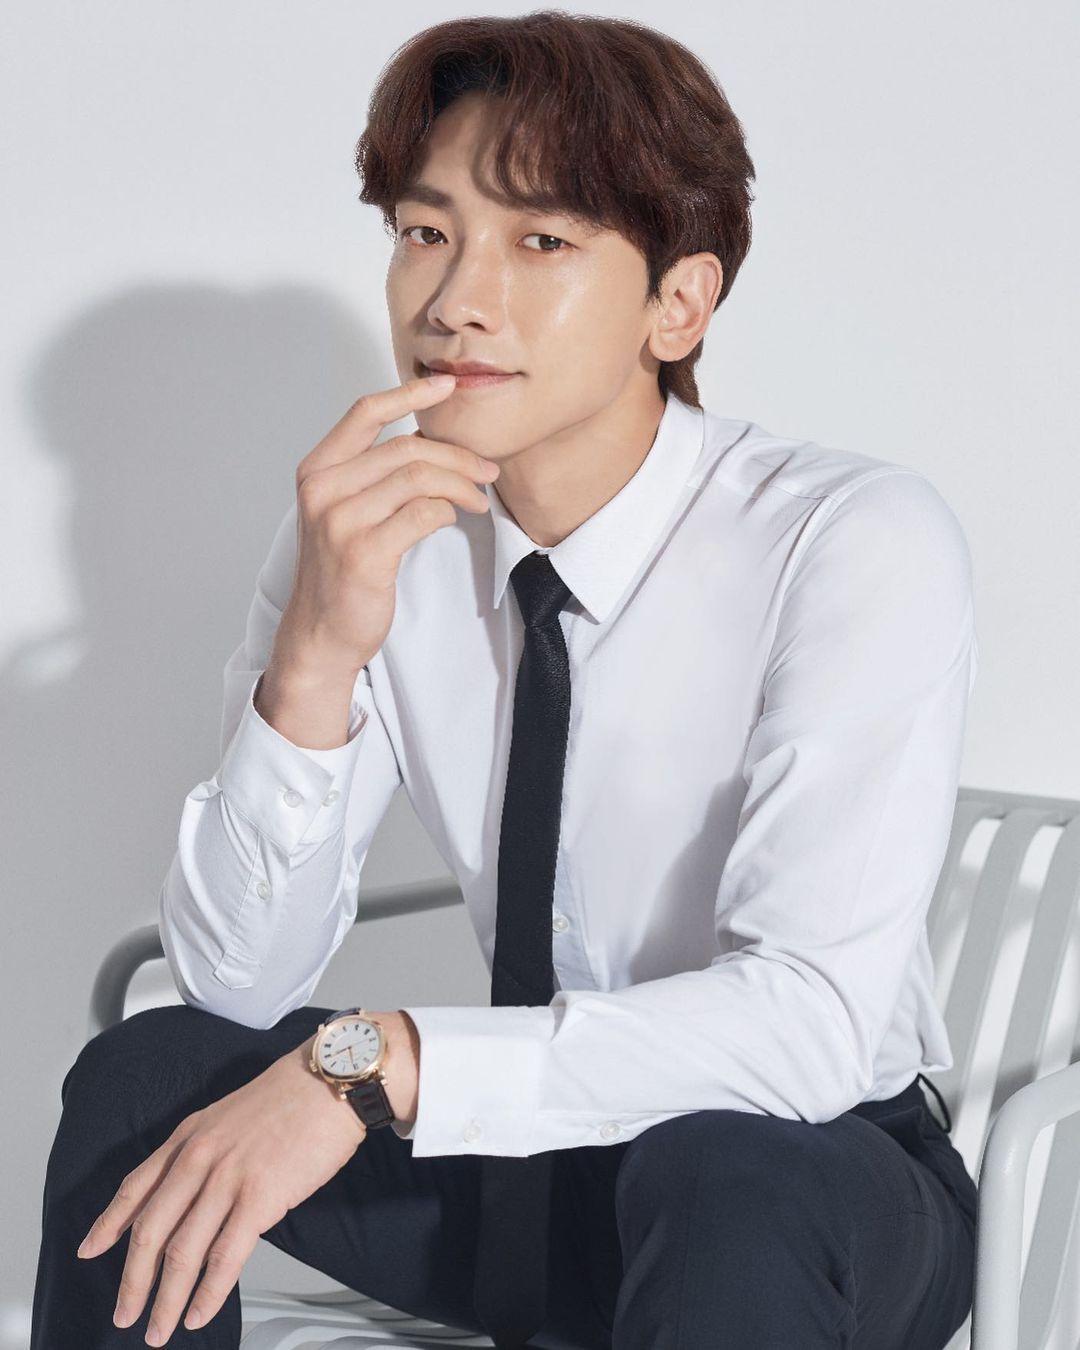 Korean actors who've established their entertainment agencies: Rain